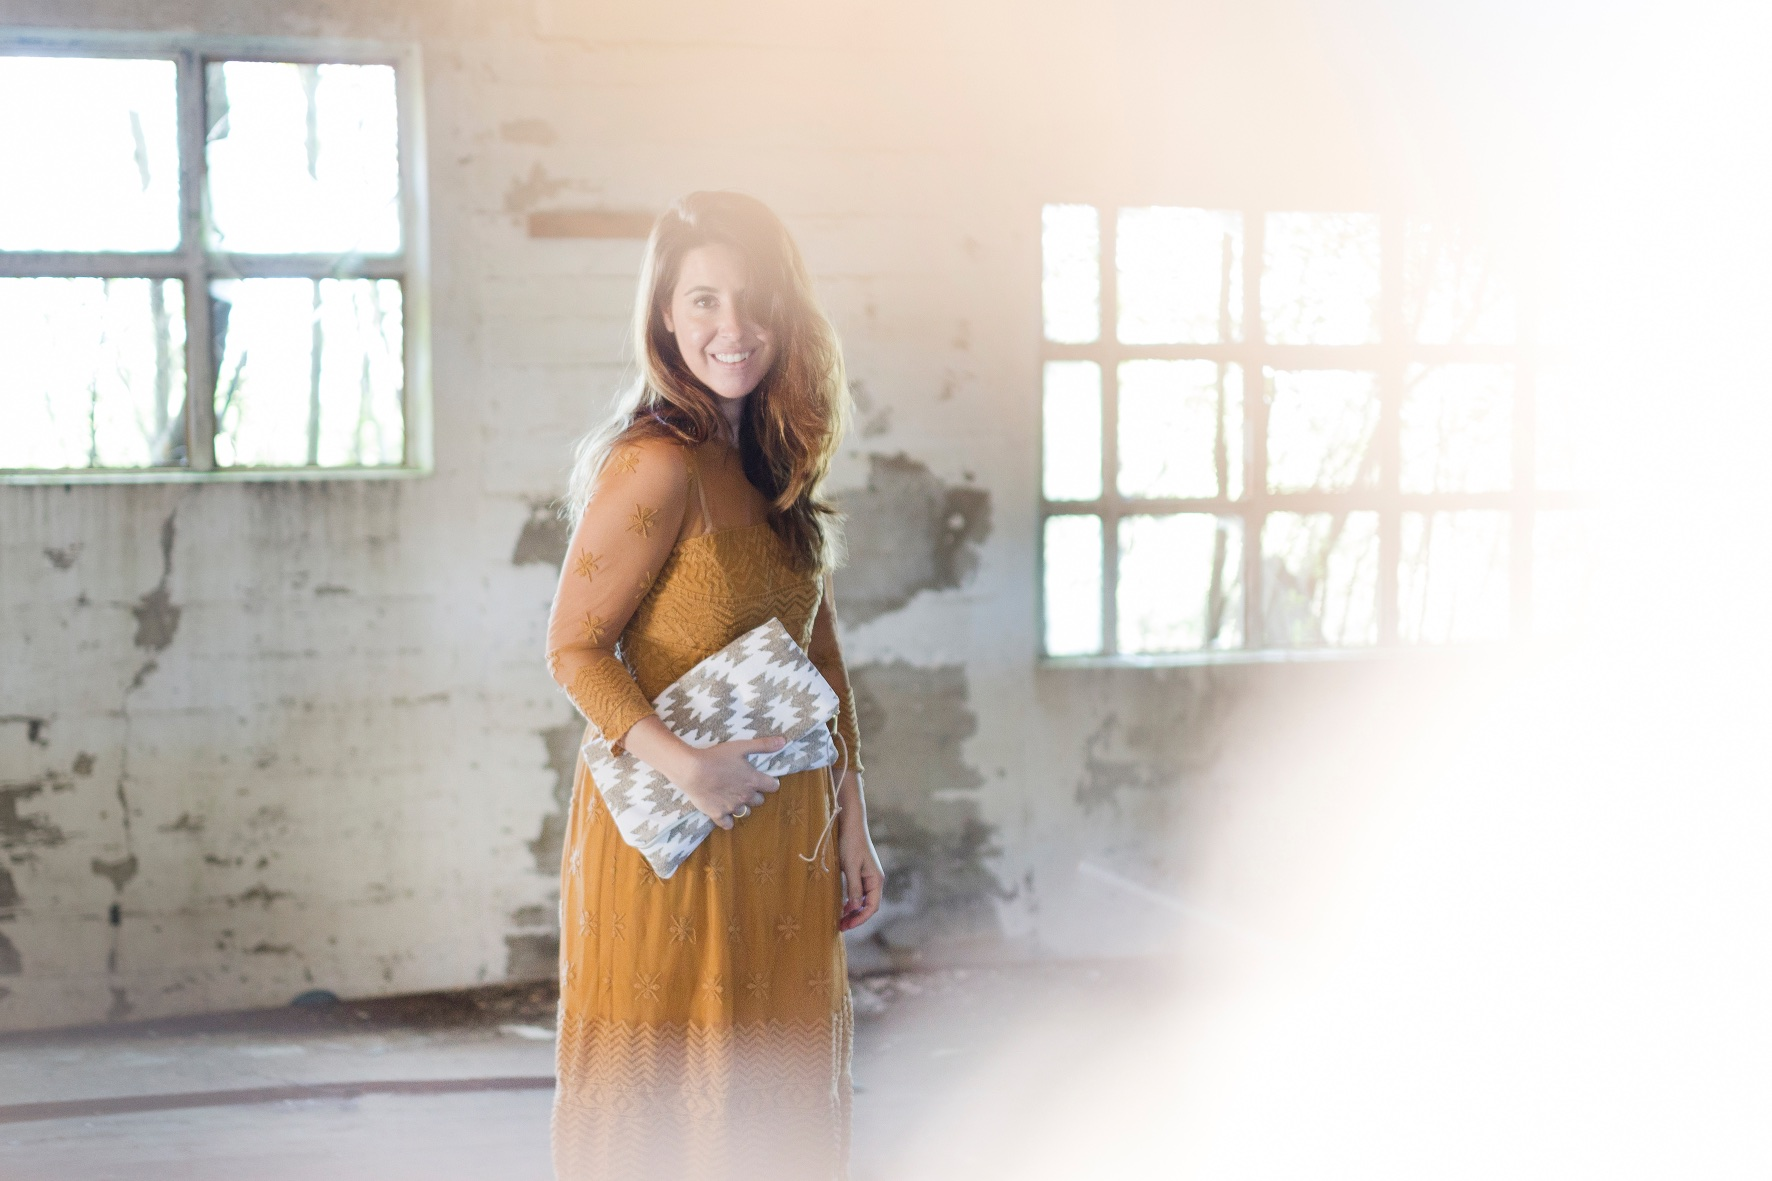 vestido mostaza - descalzaporelparque - zara - style - blogger - fashion